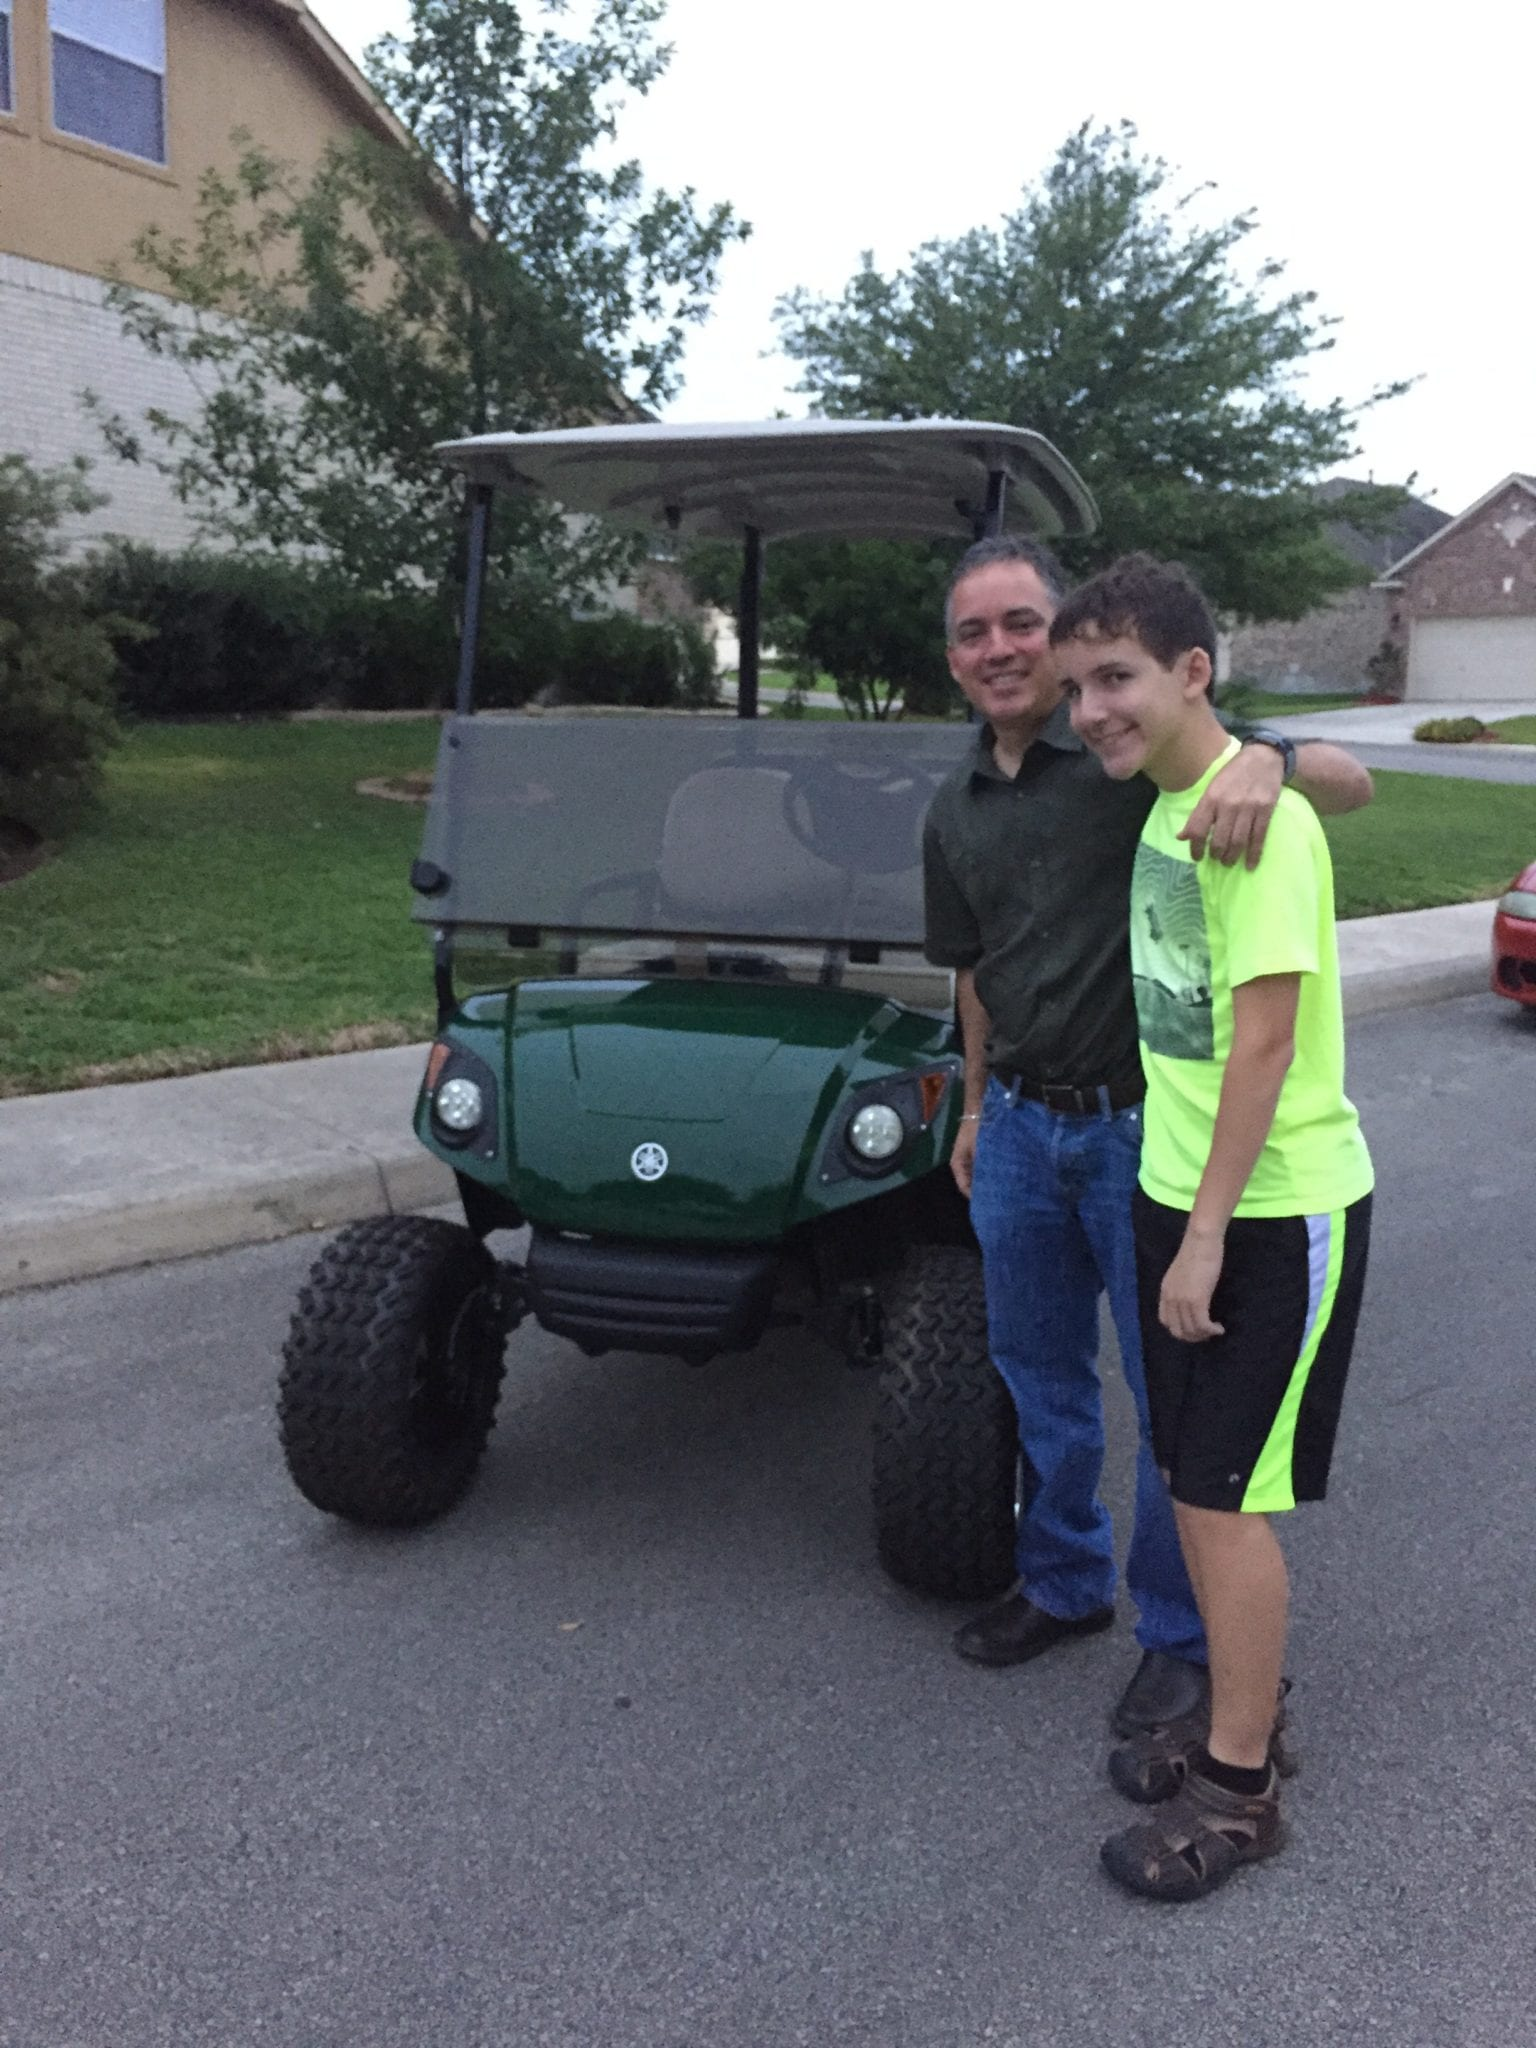 2017 Sporting Clay Shoot Raises 58,000 Dollars - Blue Cares on shotgun gun carts, used sporting clays carts, stroller shooting carts,